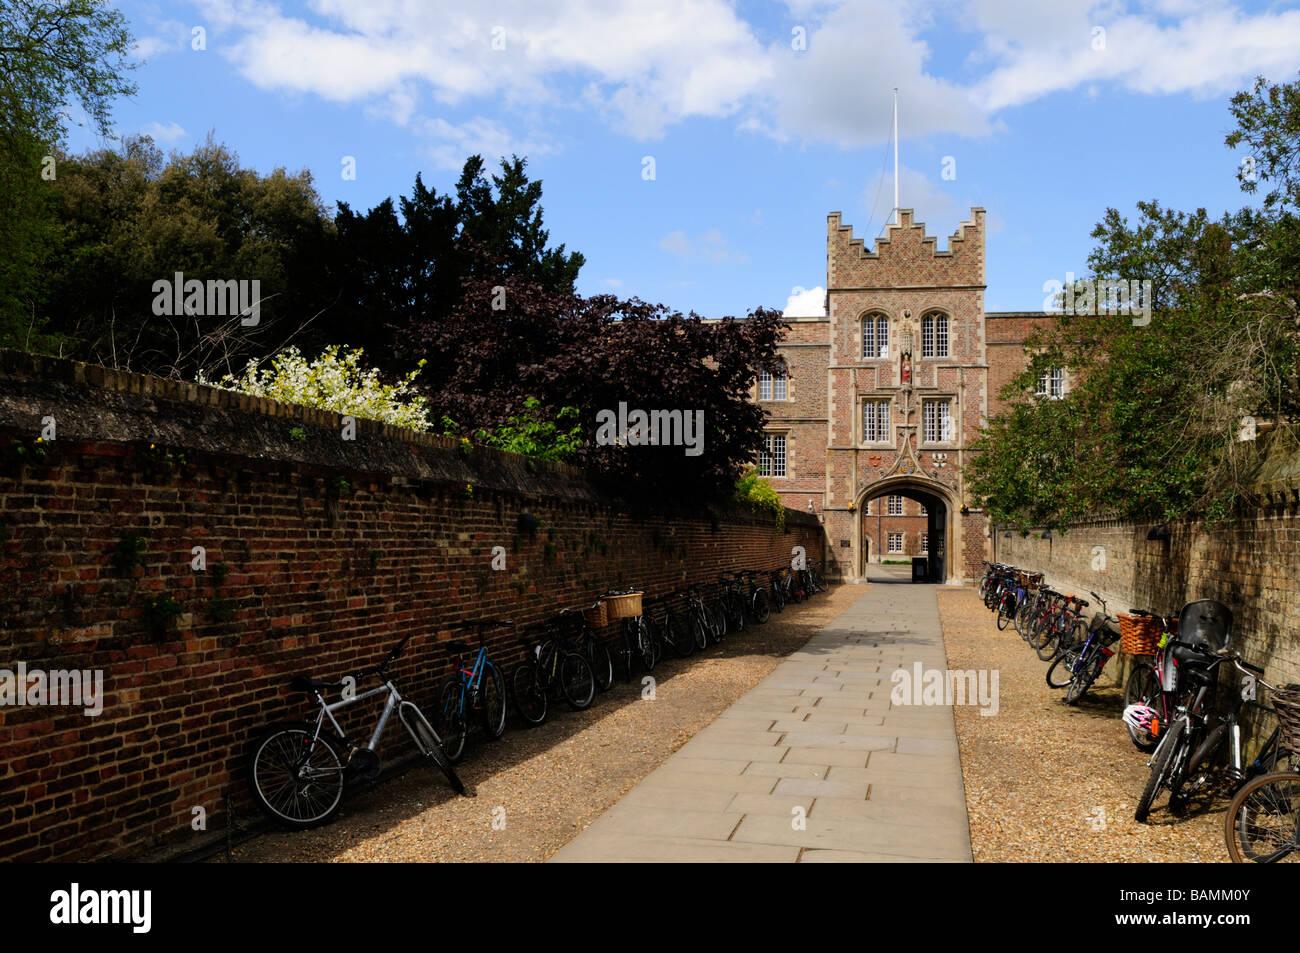 Jesus College, Cambridge, England, Uk - Stock Image